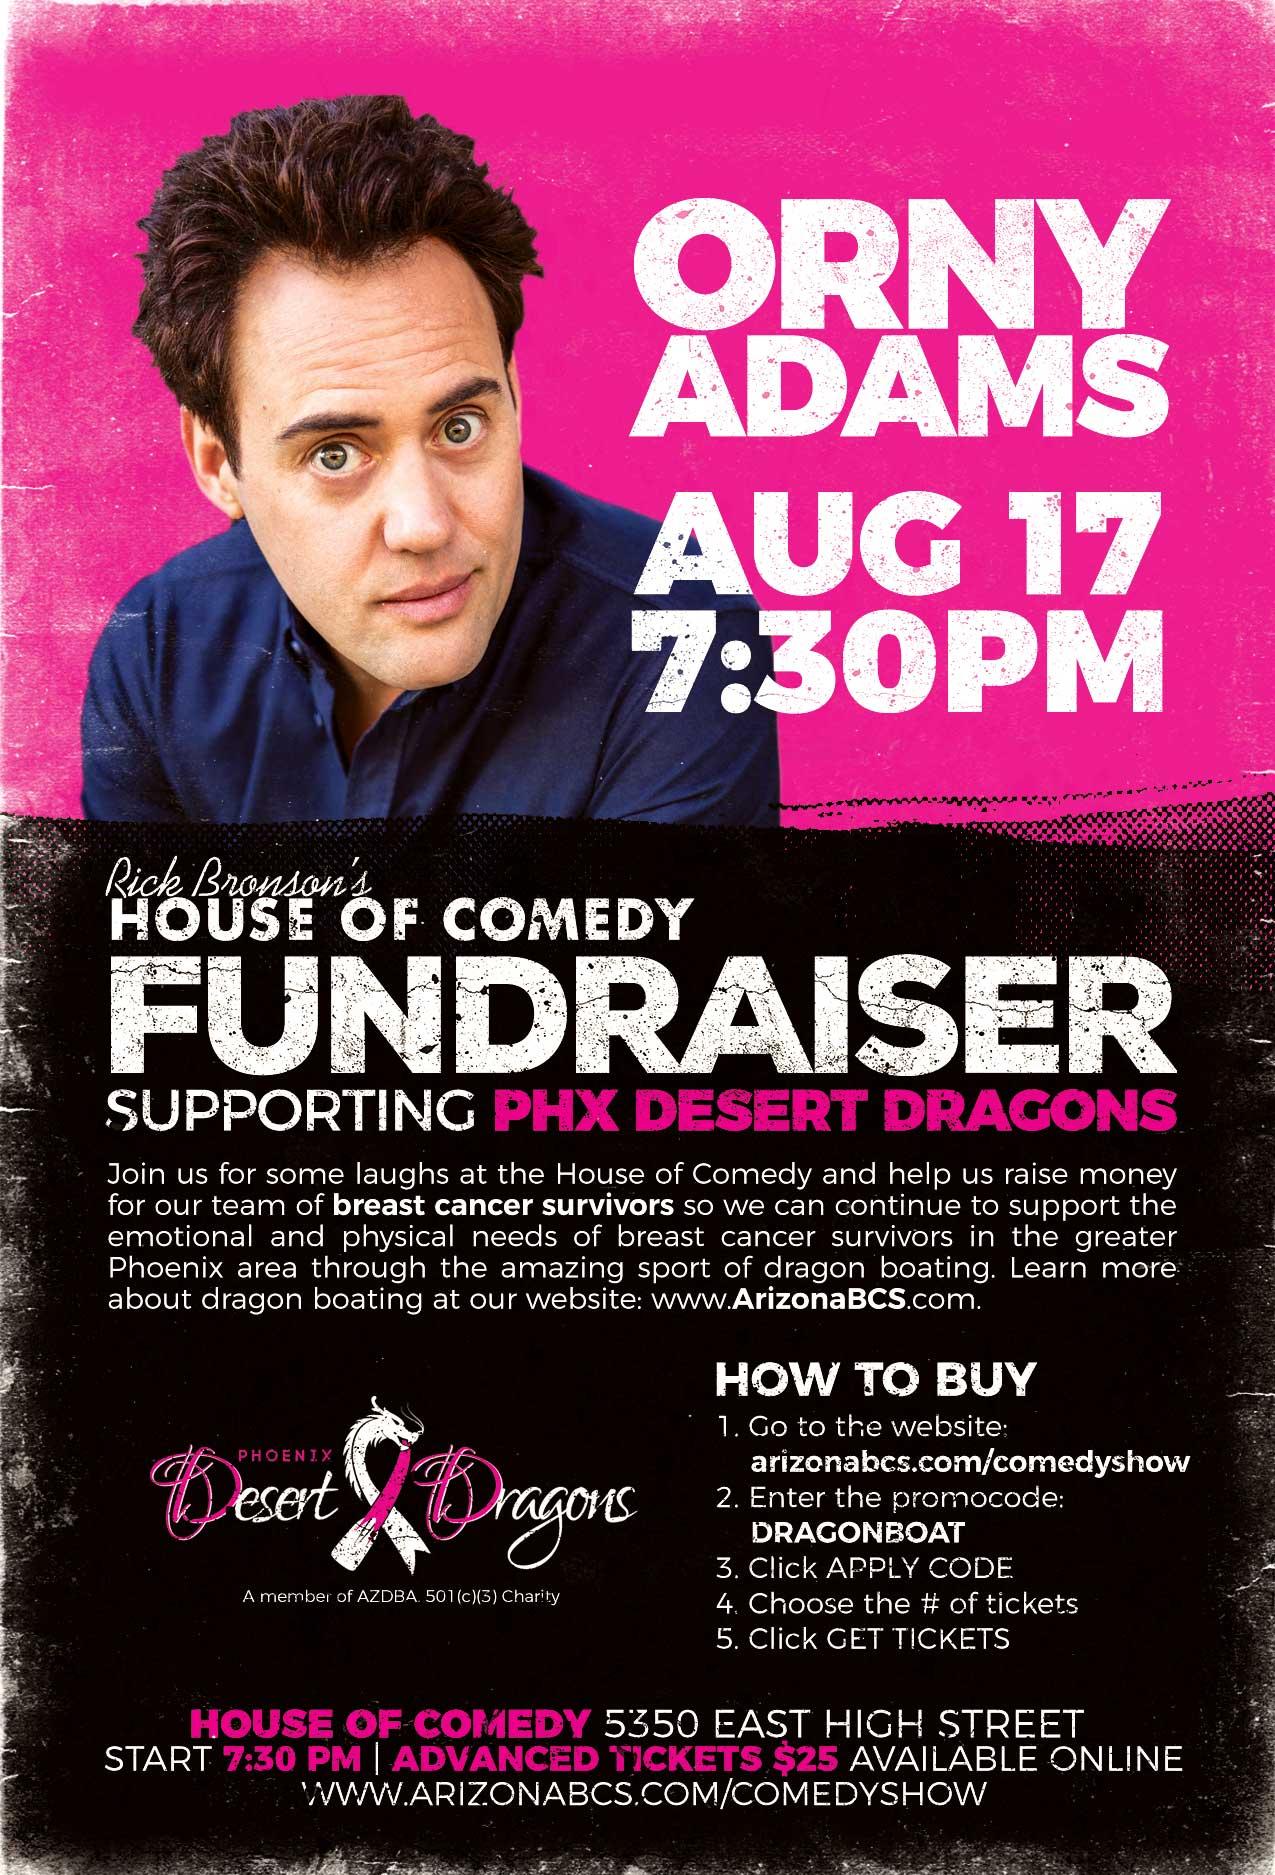 Fundraiser Orny Adams House of Comedy